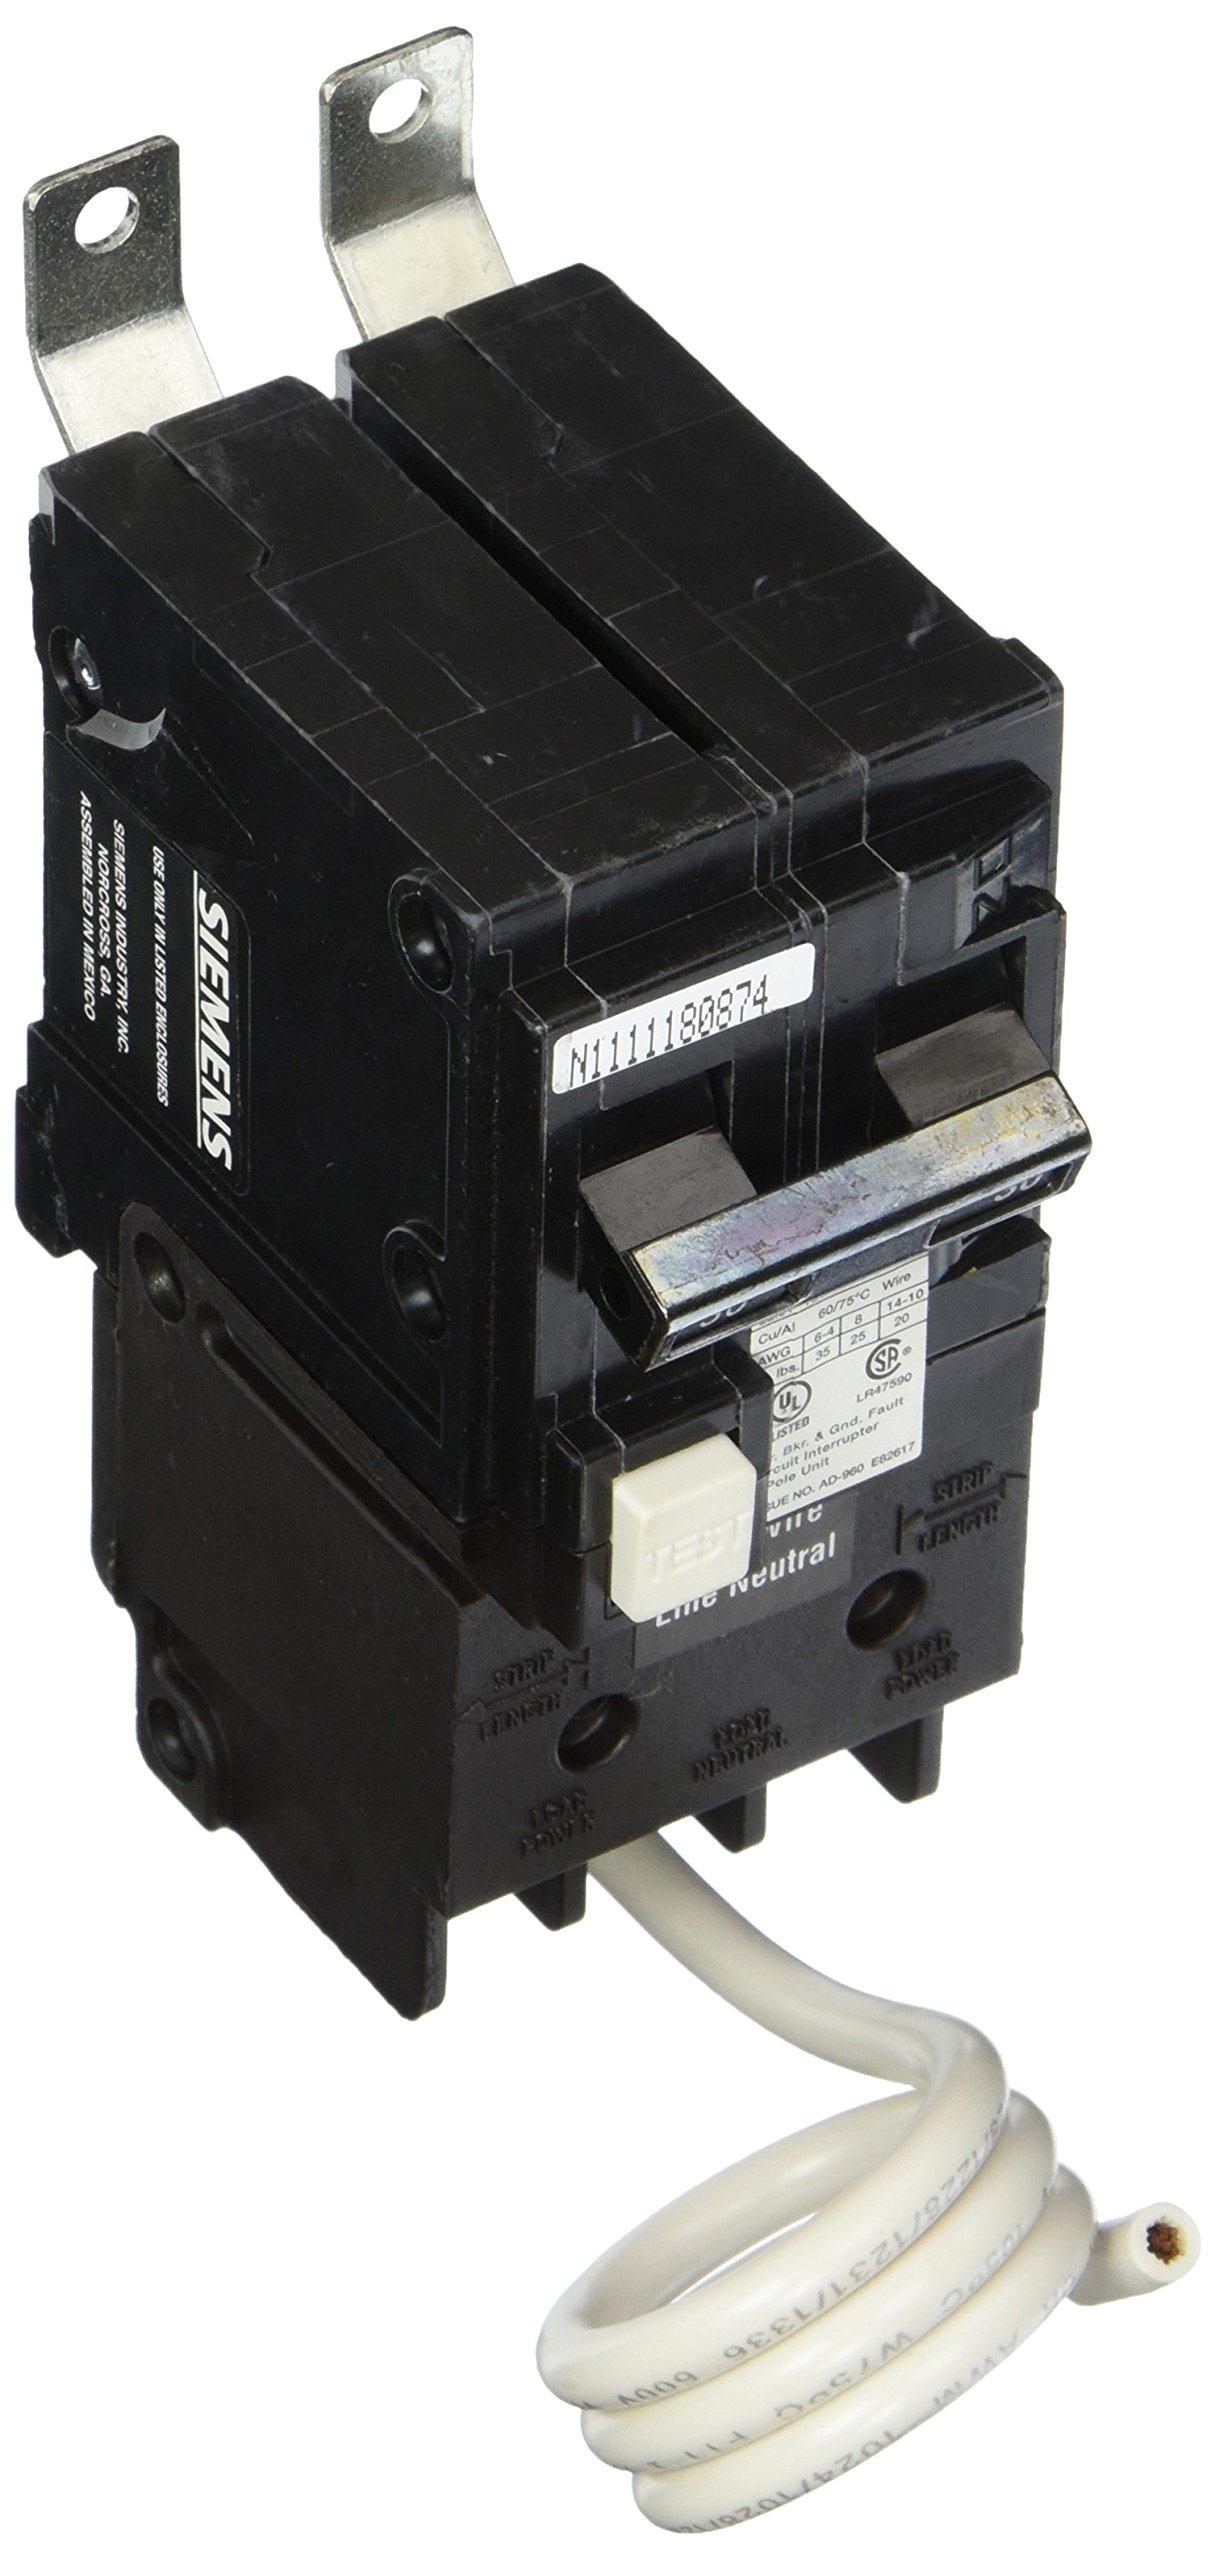 Siemens BF230H 30-Amp Double Pole 120 / 240-Volt 22KAIC Ground Fault Circuit interrupter